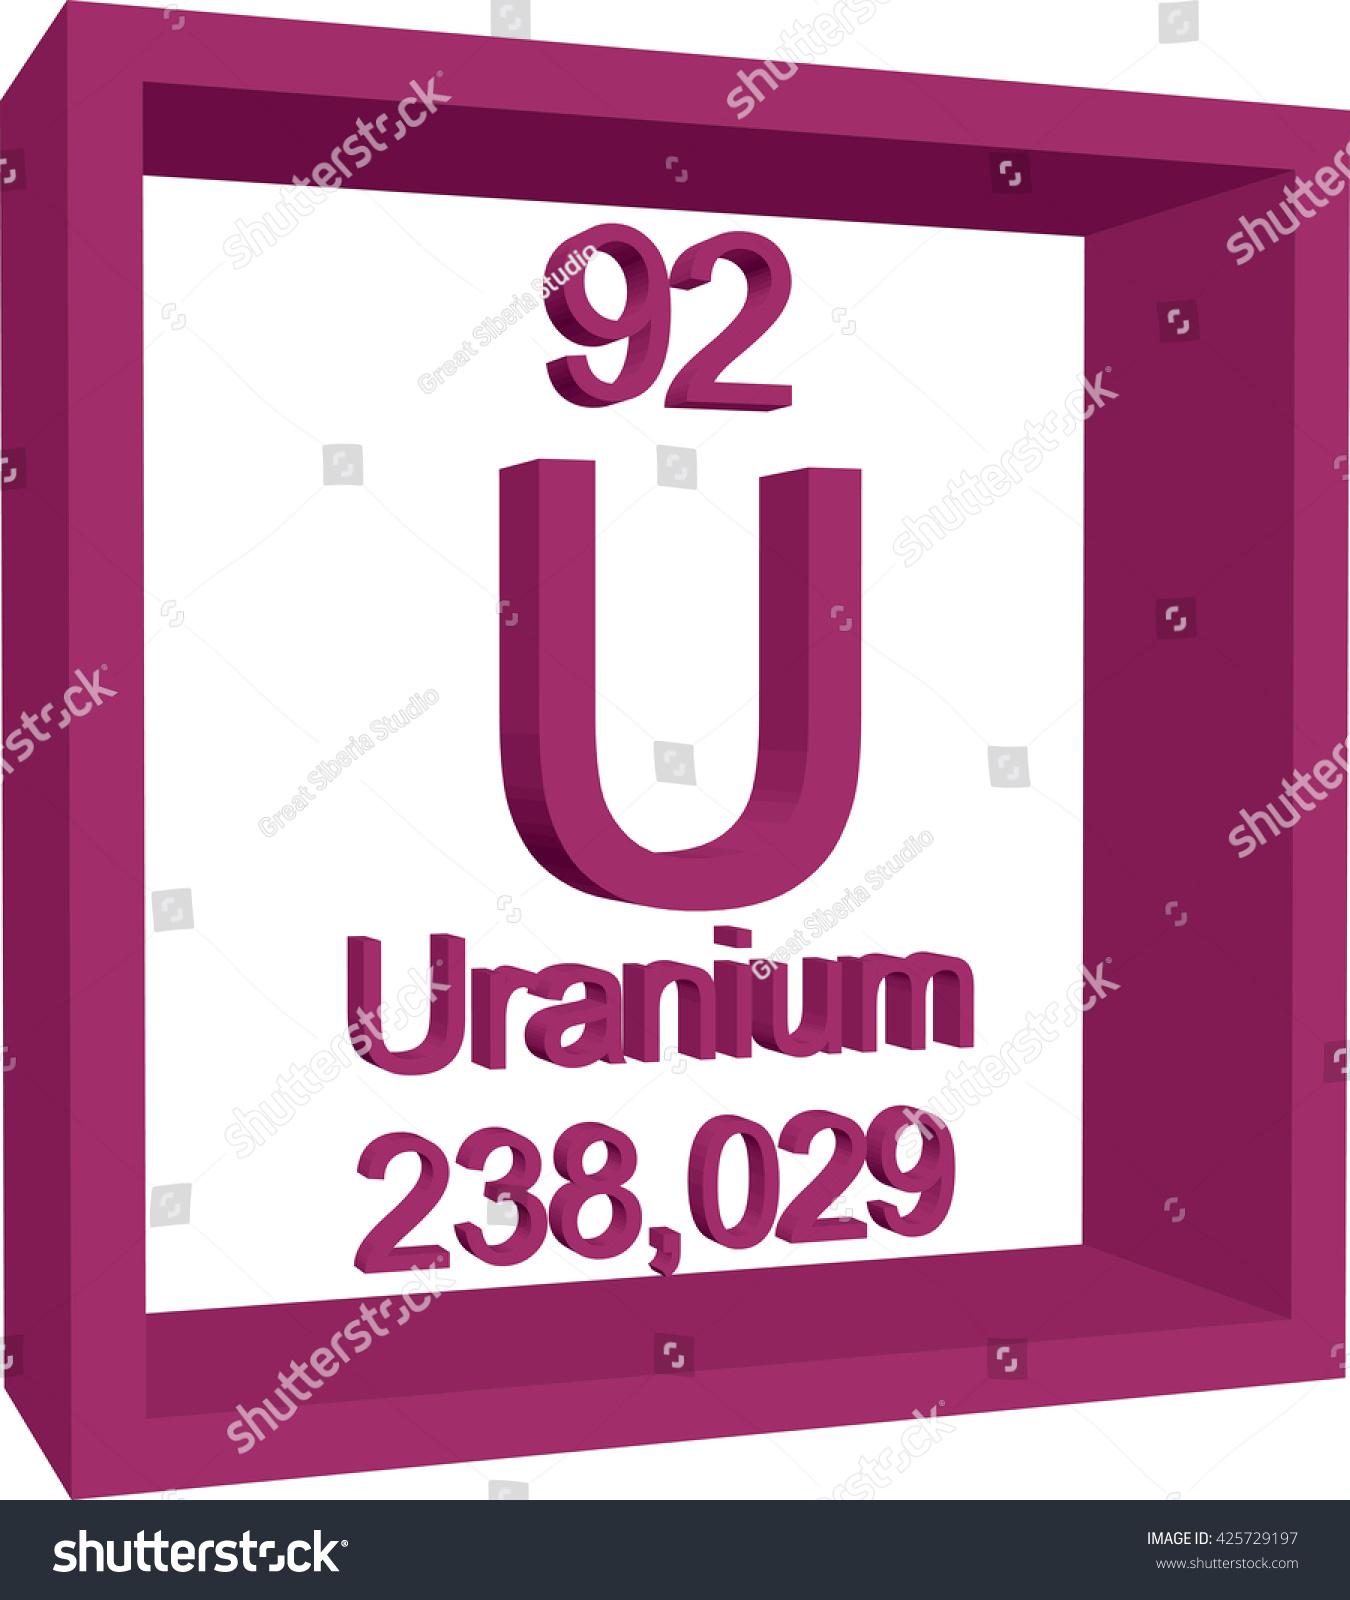 U element periodic table gallery periodic table images uranium symbol periodic table image collections periodic table uranium on the periodic table image collections periodic gamestrikefo Choice Image